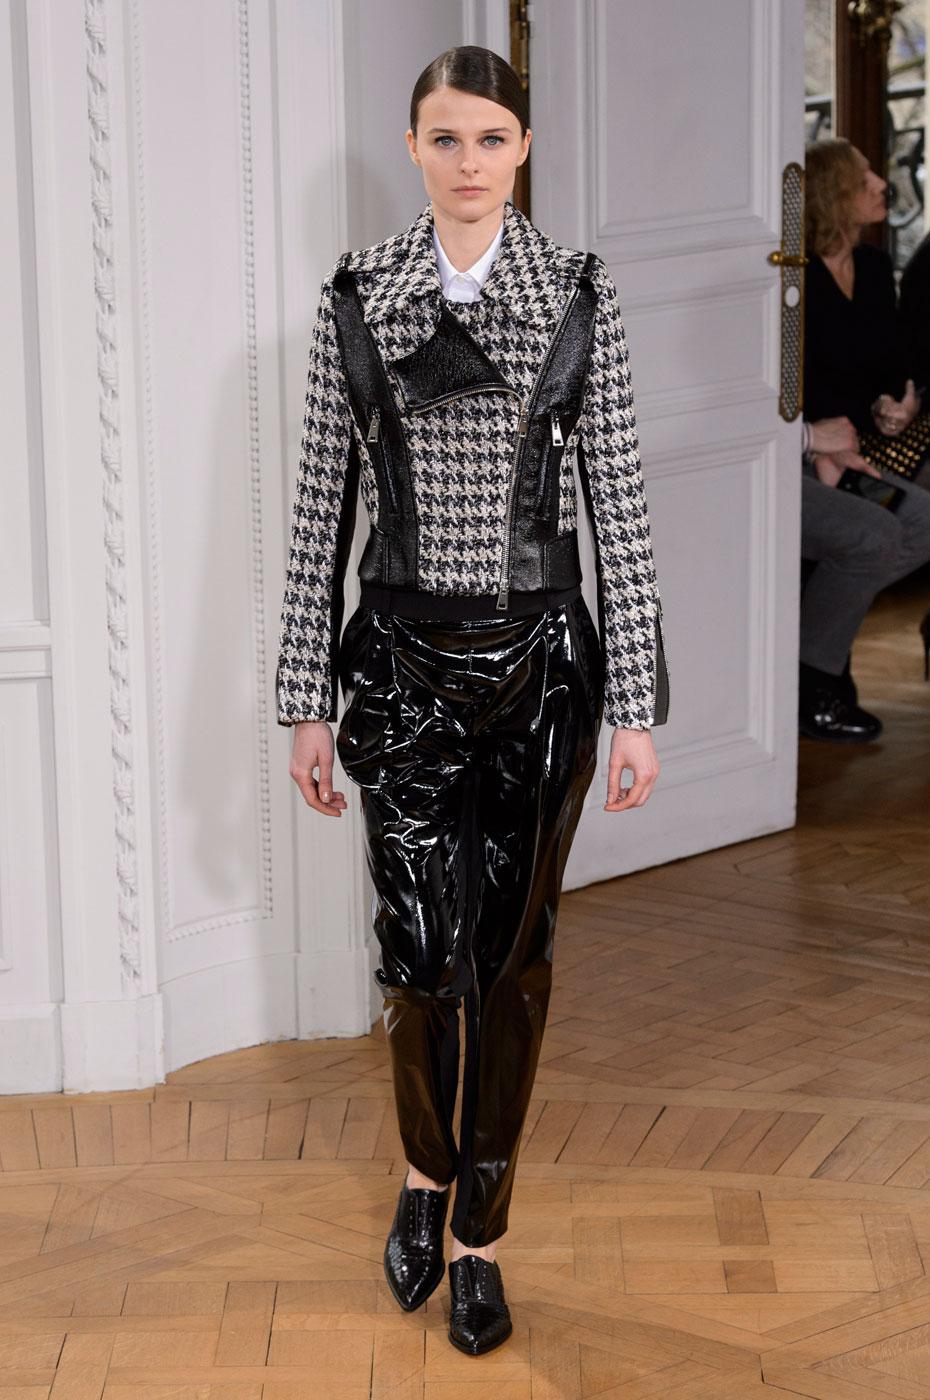 Bouchra-Jarrar-fashion-runway-show-haute-couture-paris-spring-summer-2015-the-impression-23